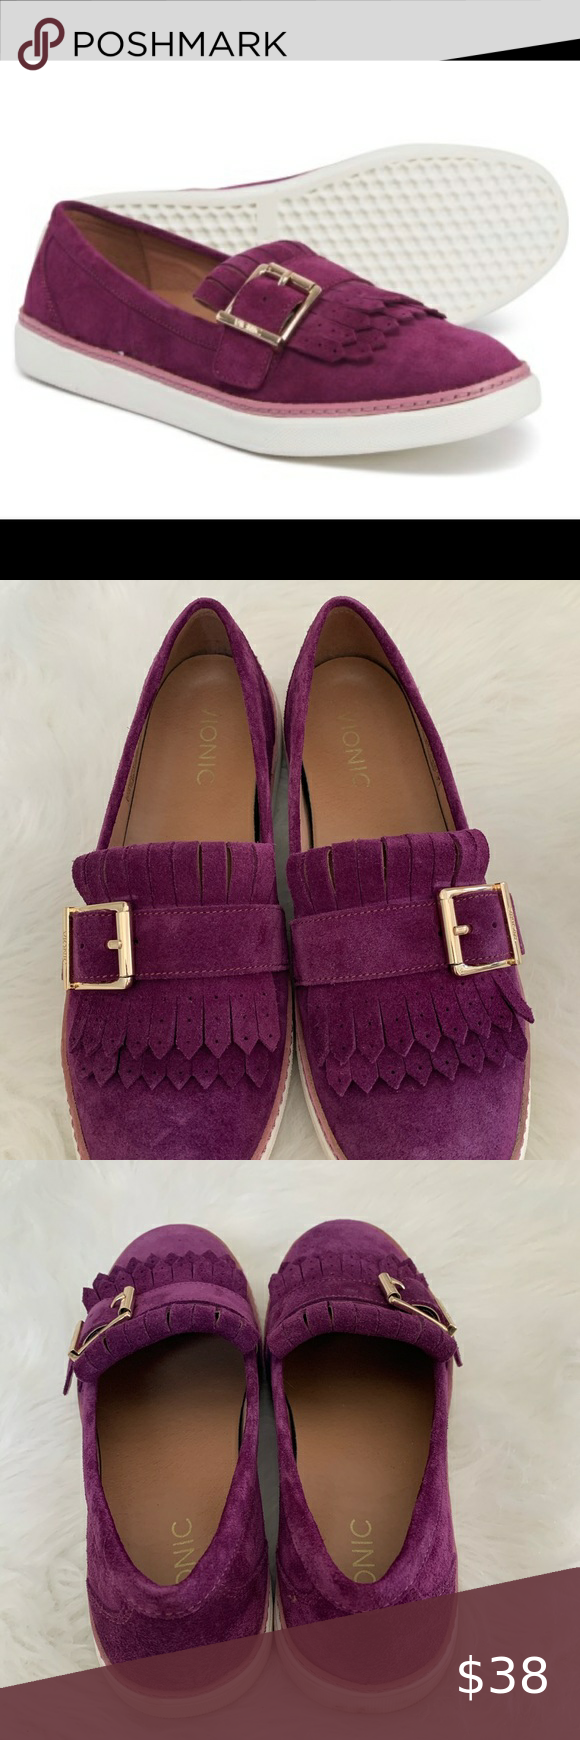 Vionic Cambridge Slip on Leather Loafer